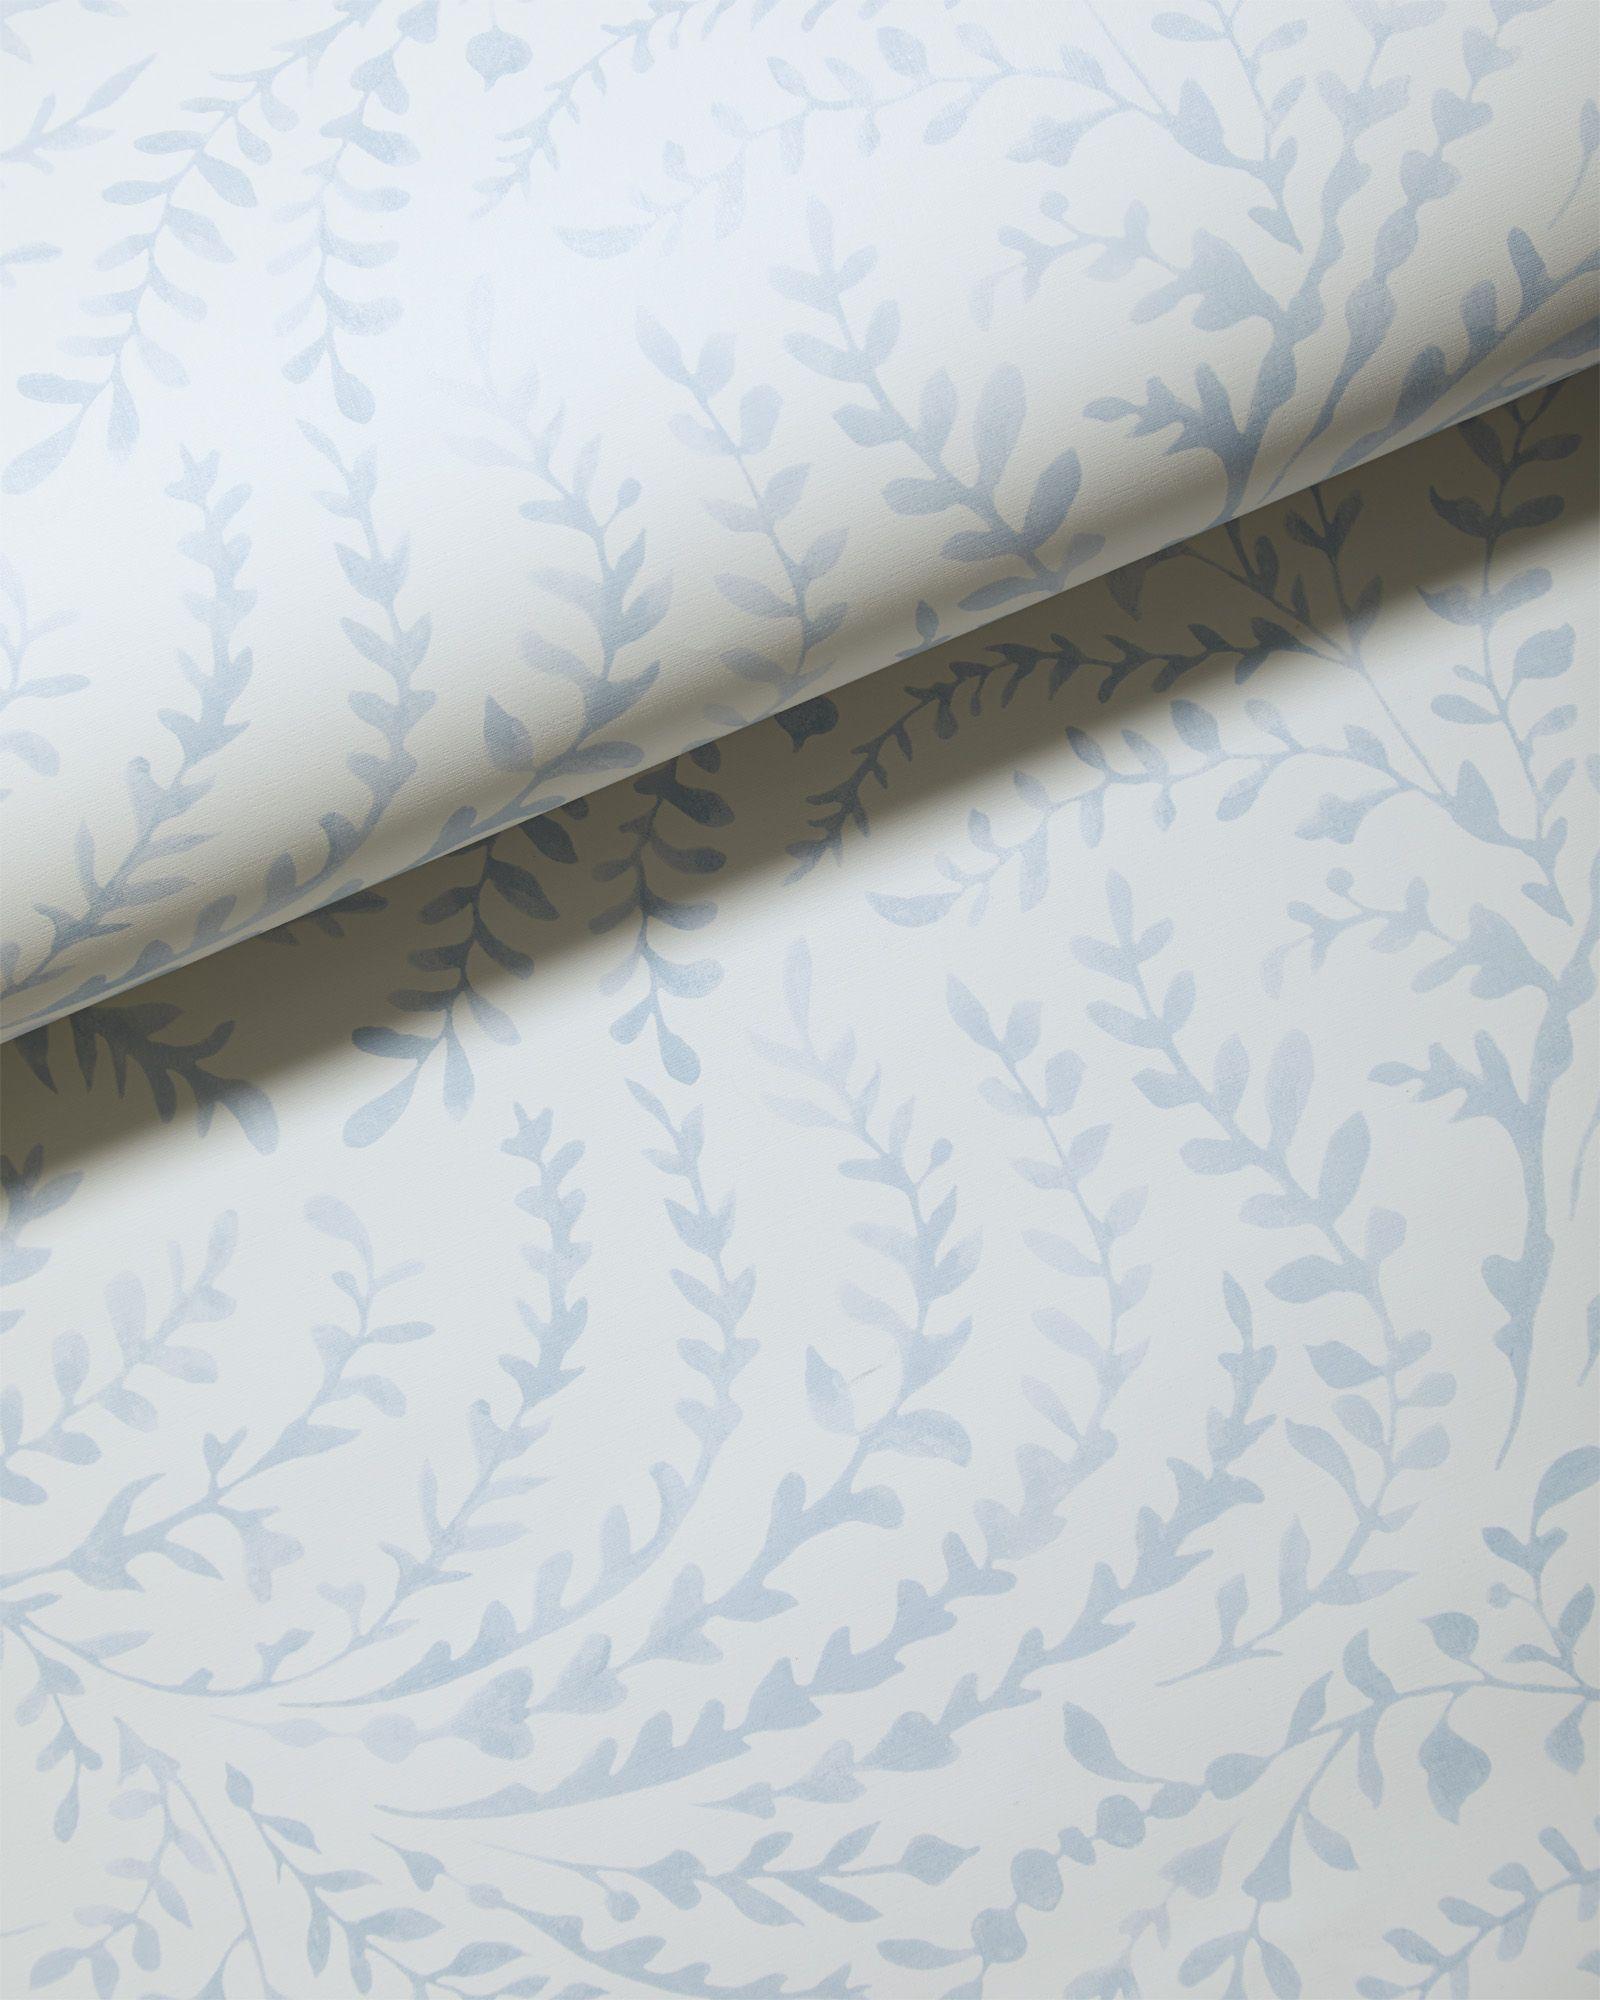 Priano Wallpaper Serena and lily wallpaper, How to hang